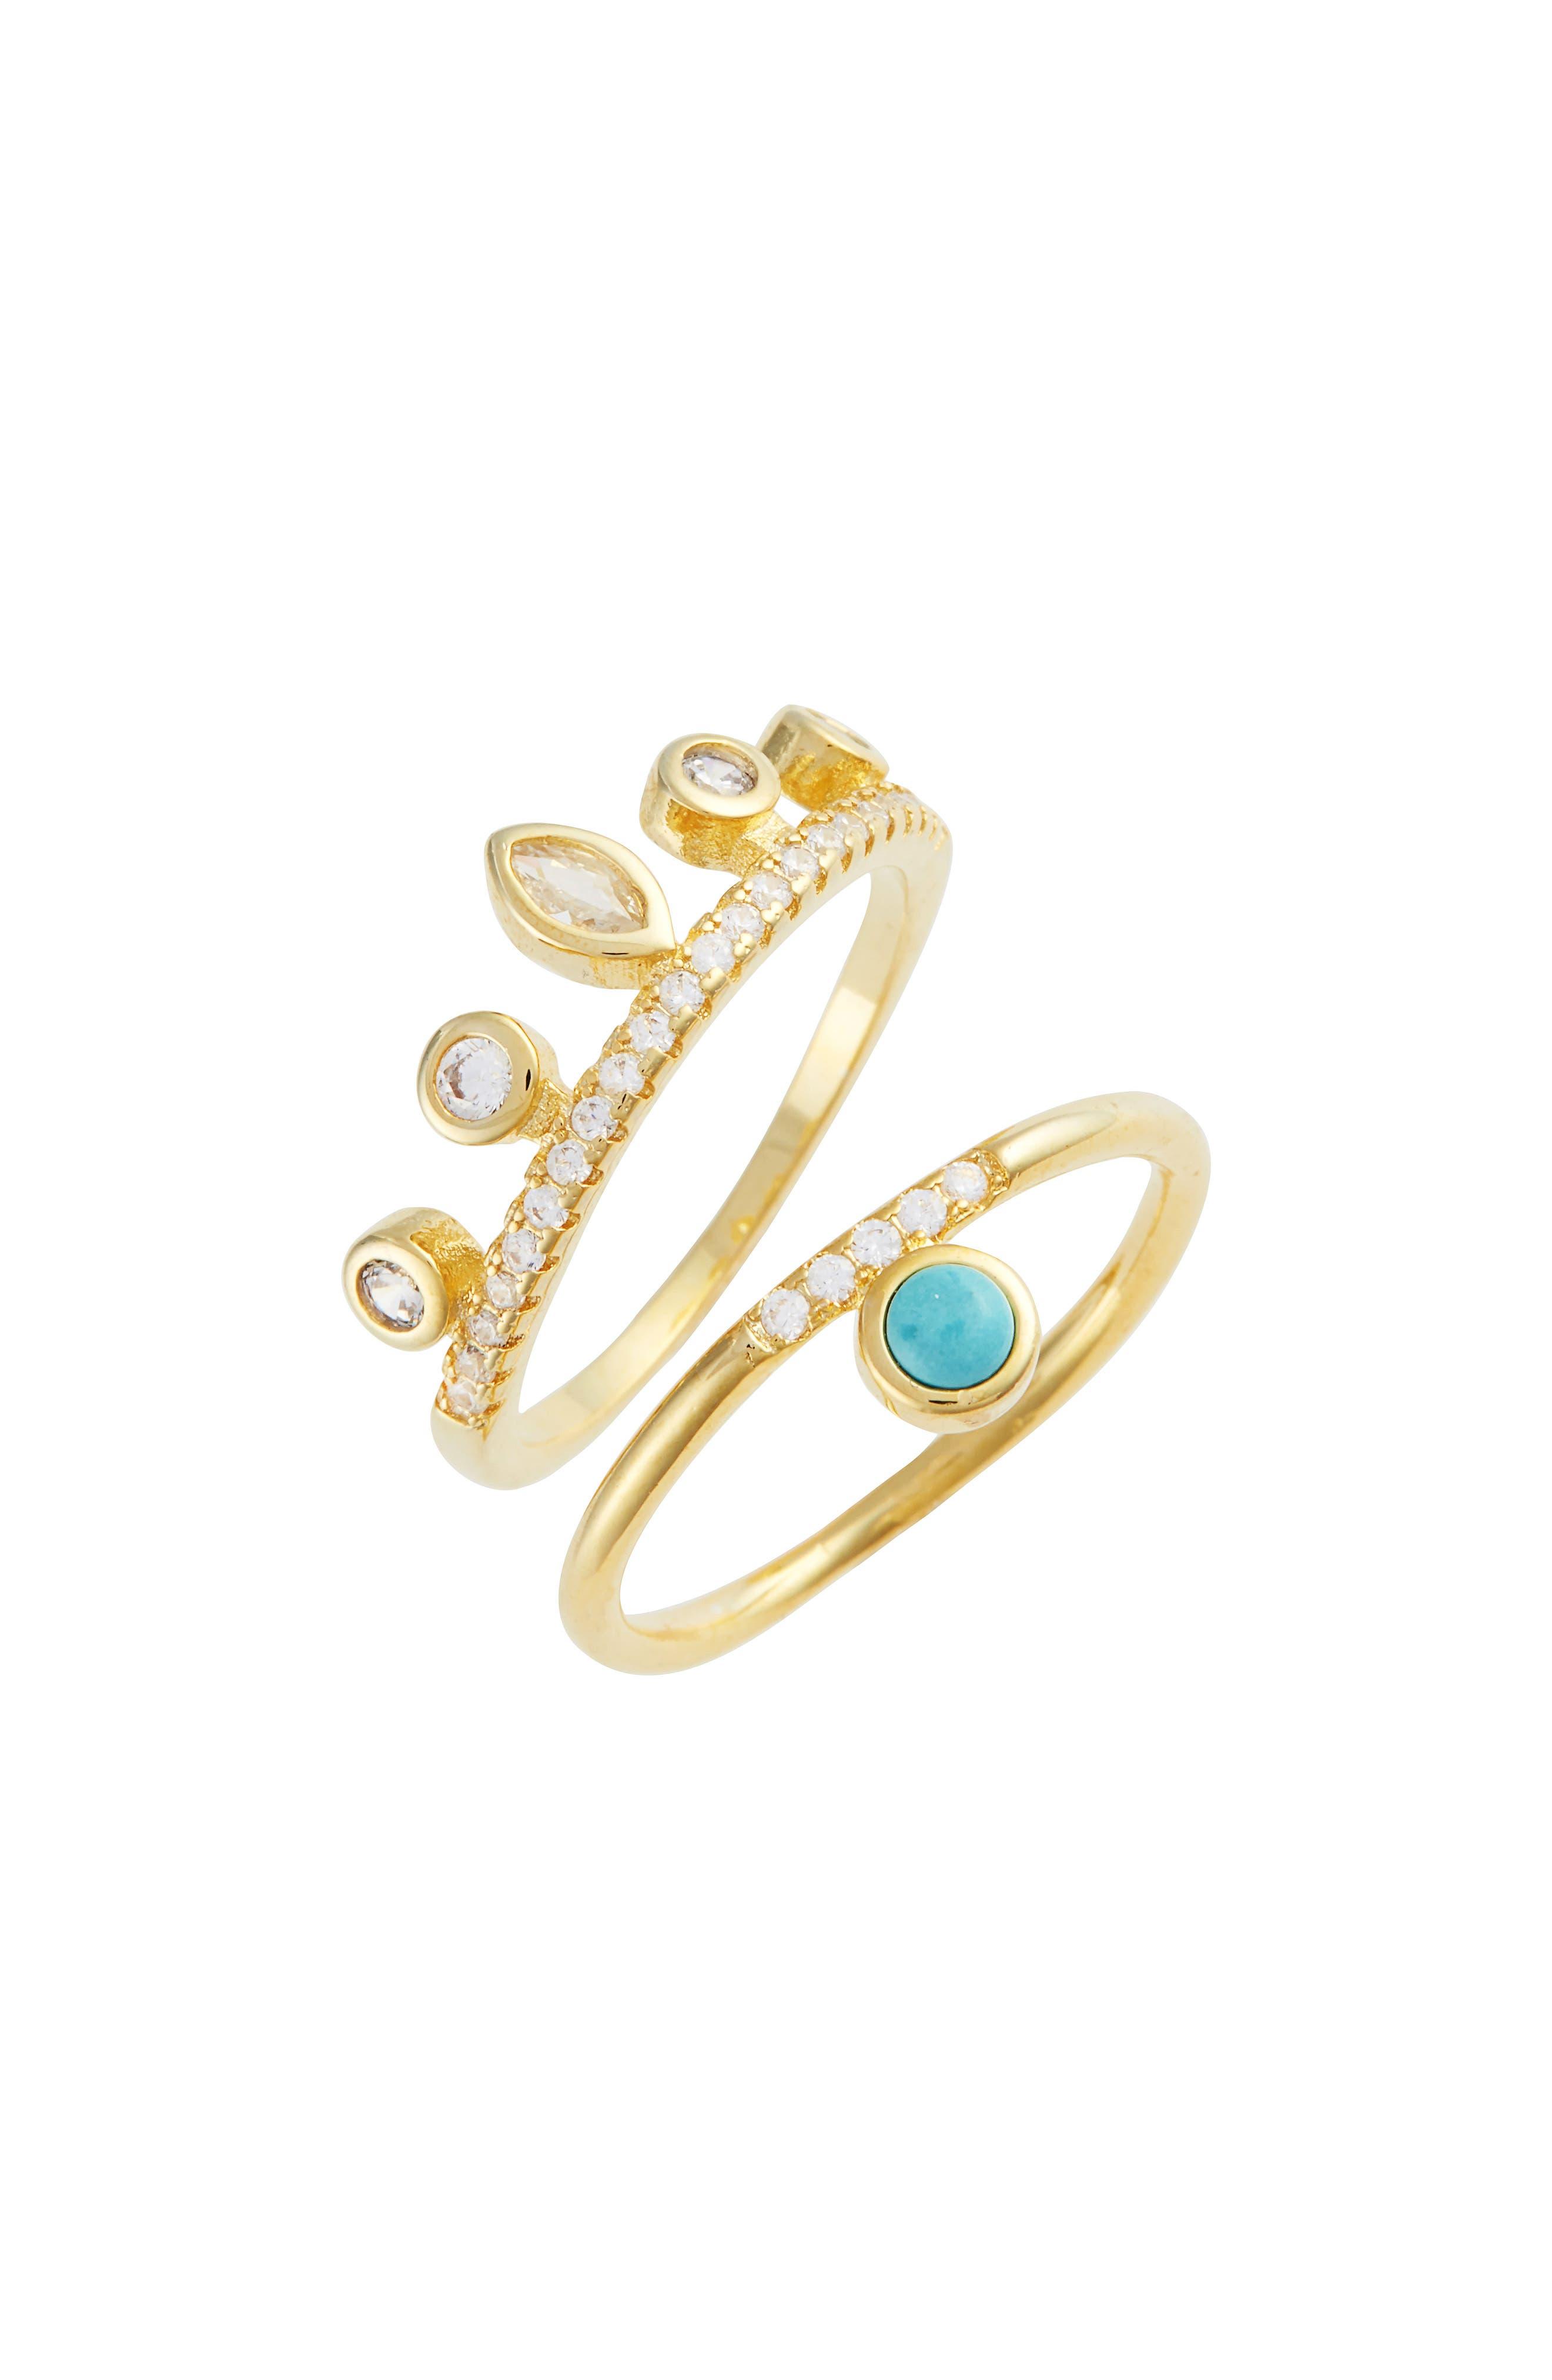 Jacinta Set of 2 Turquoise & Crystal Rings,                             Main thumbnail 1, color,                             710